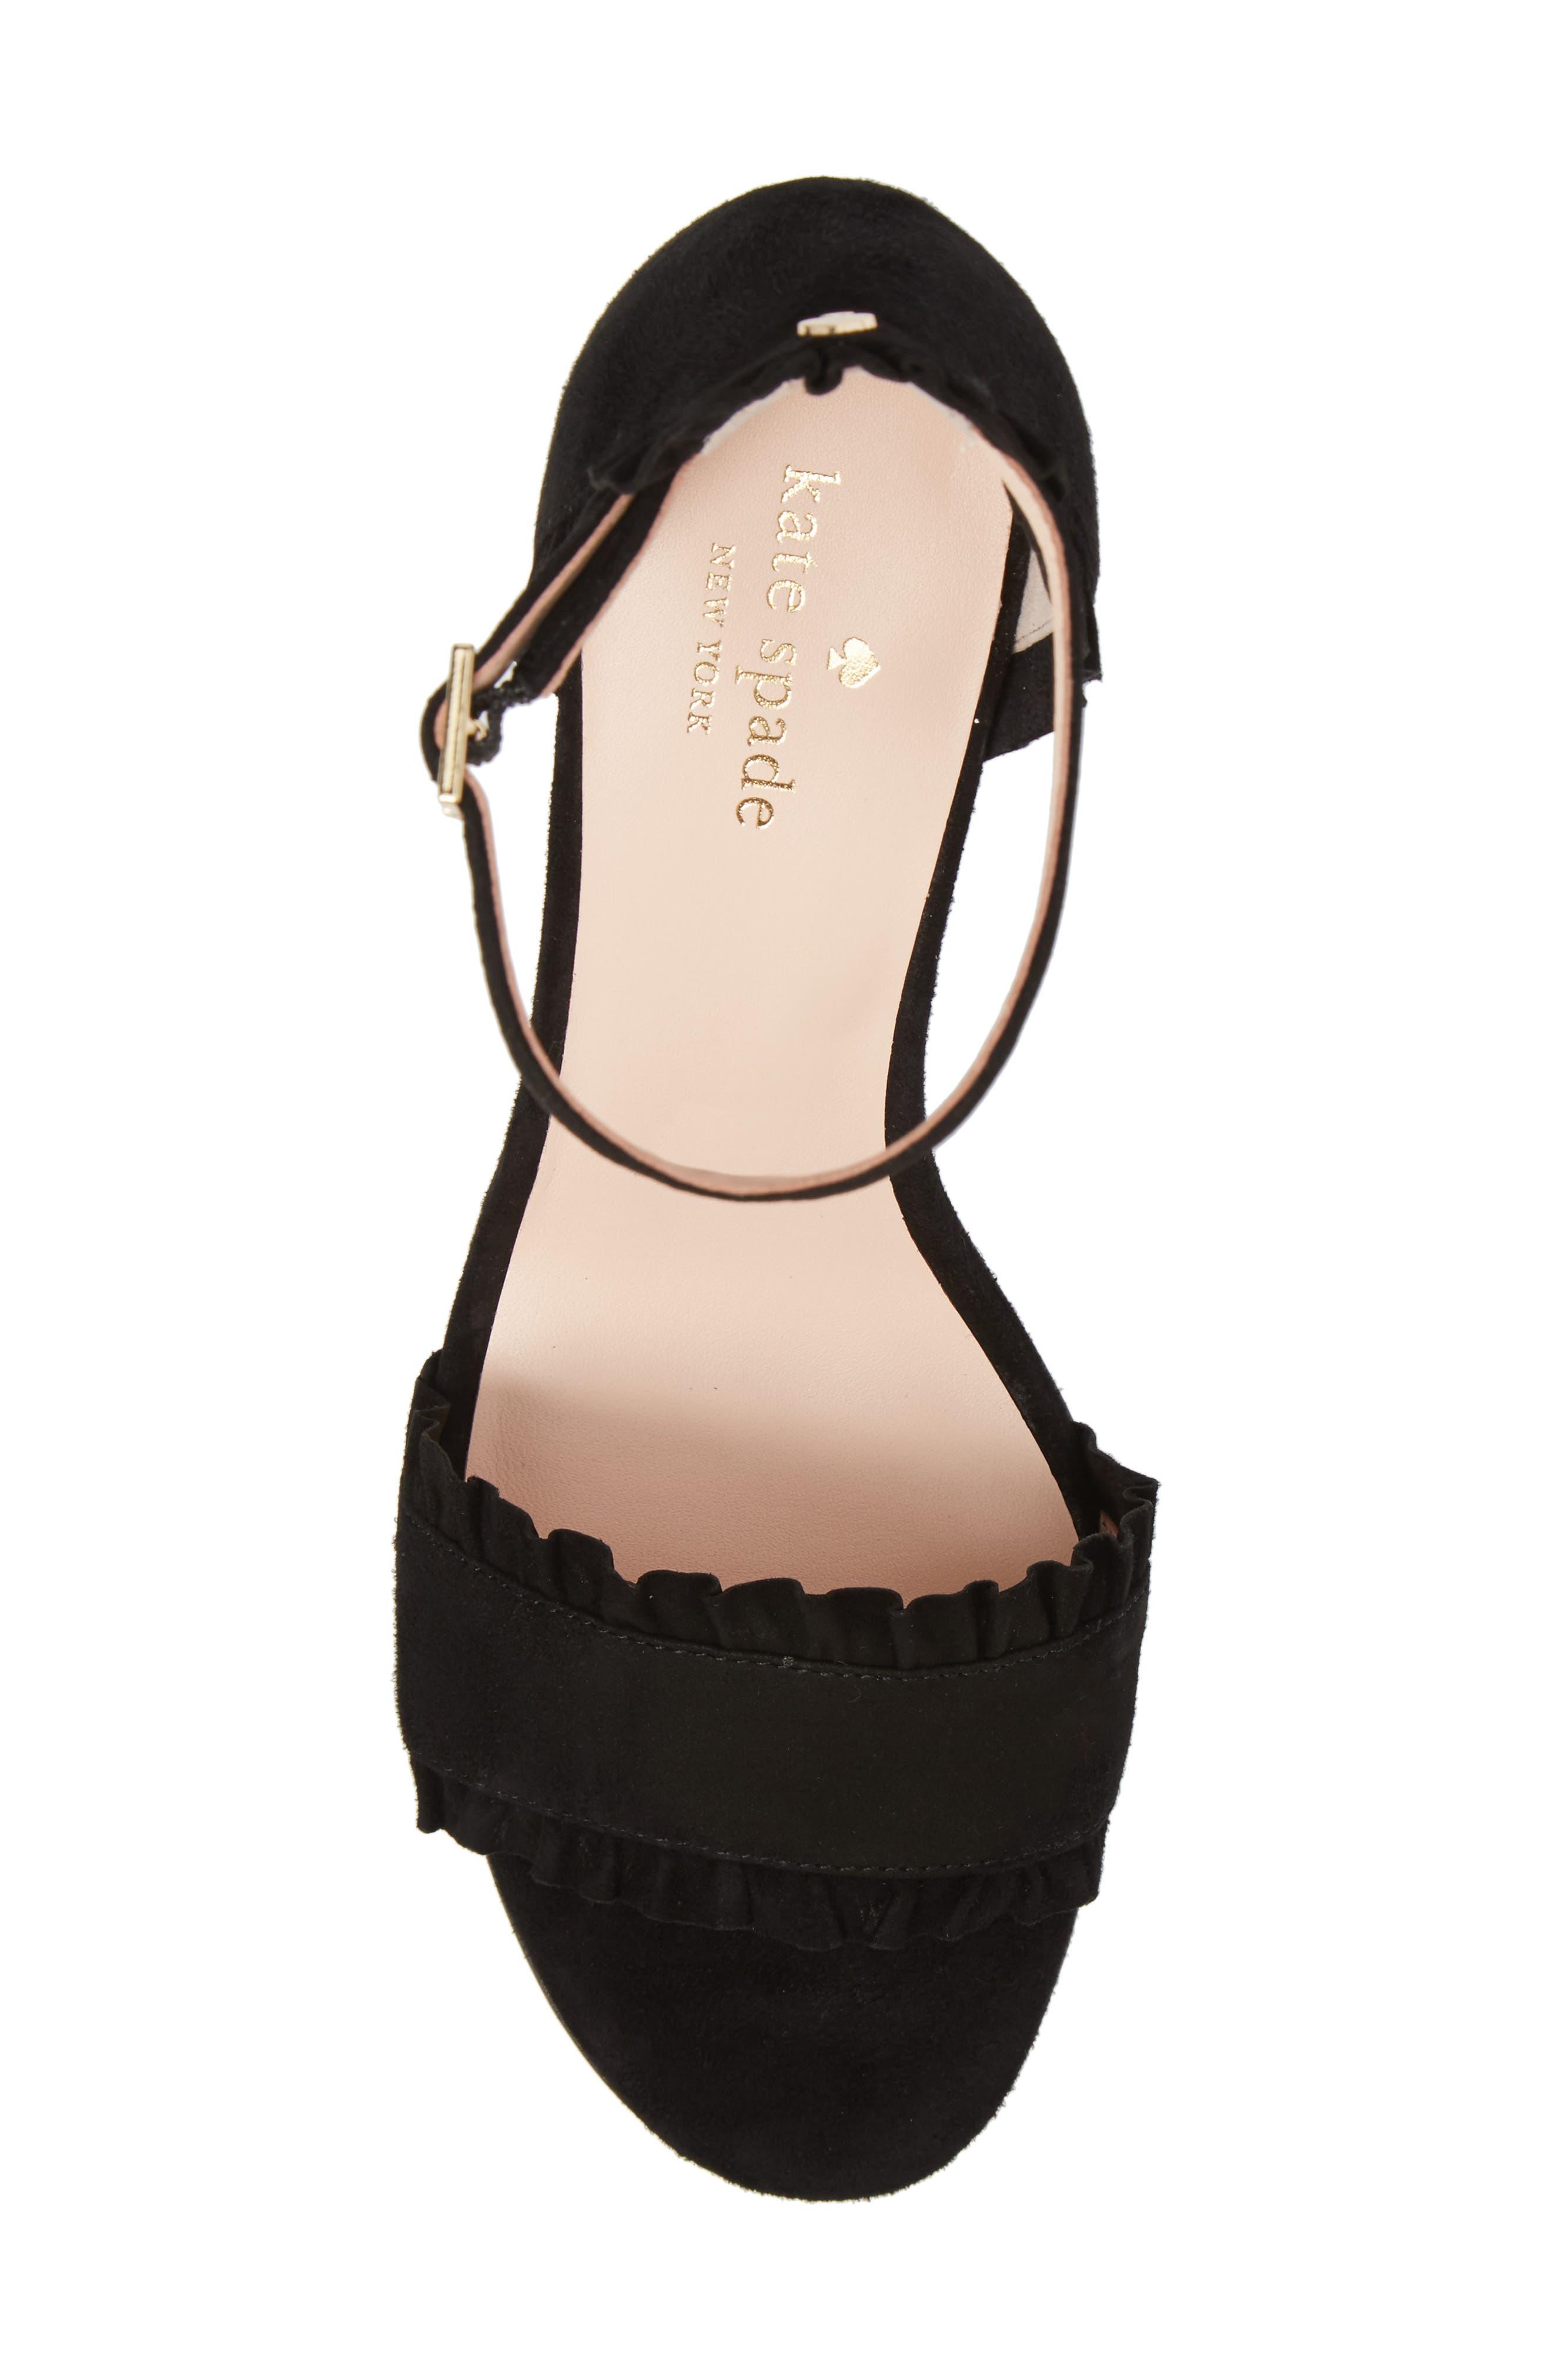 odele ruffle sandal,                             Alternate thumbnail 5, color,                             Black Suede